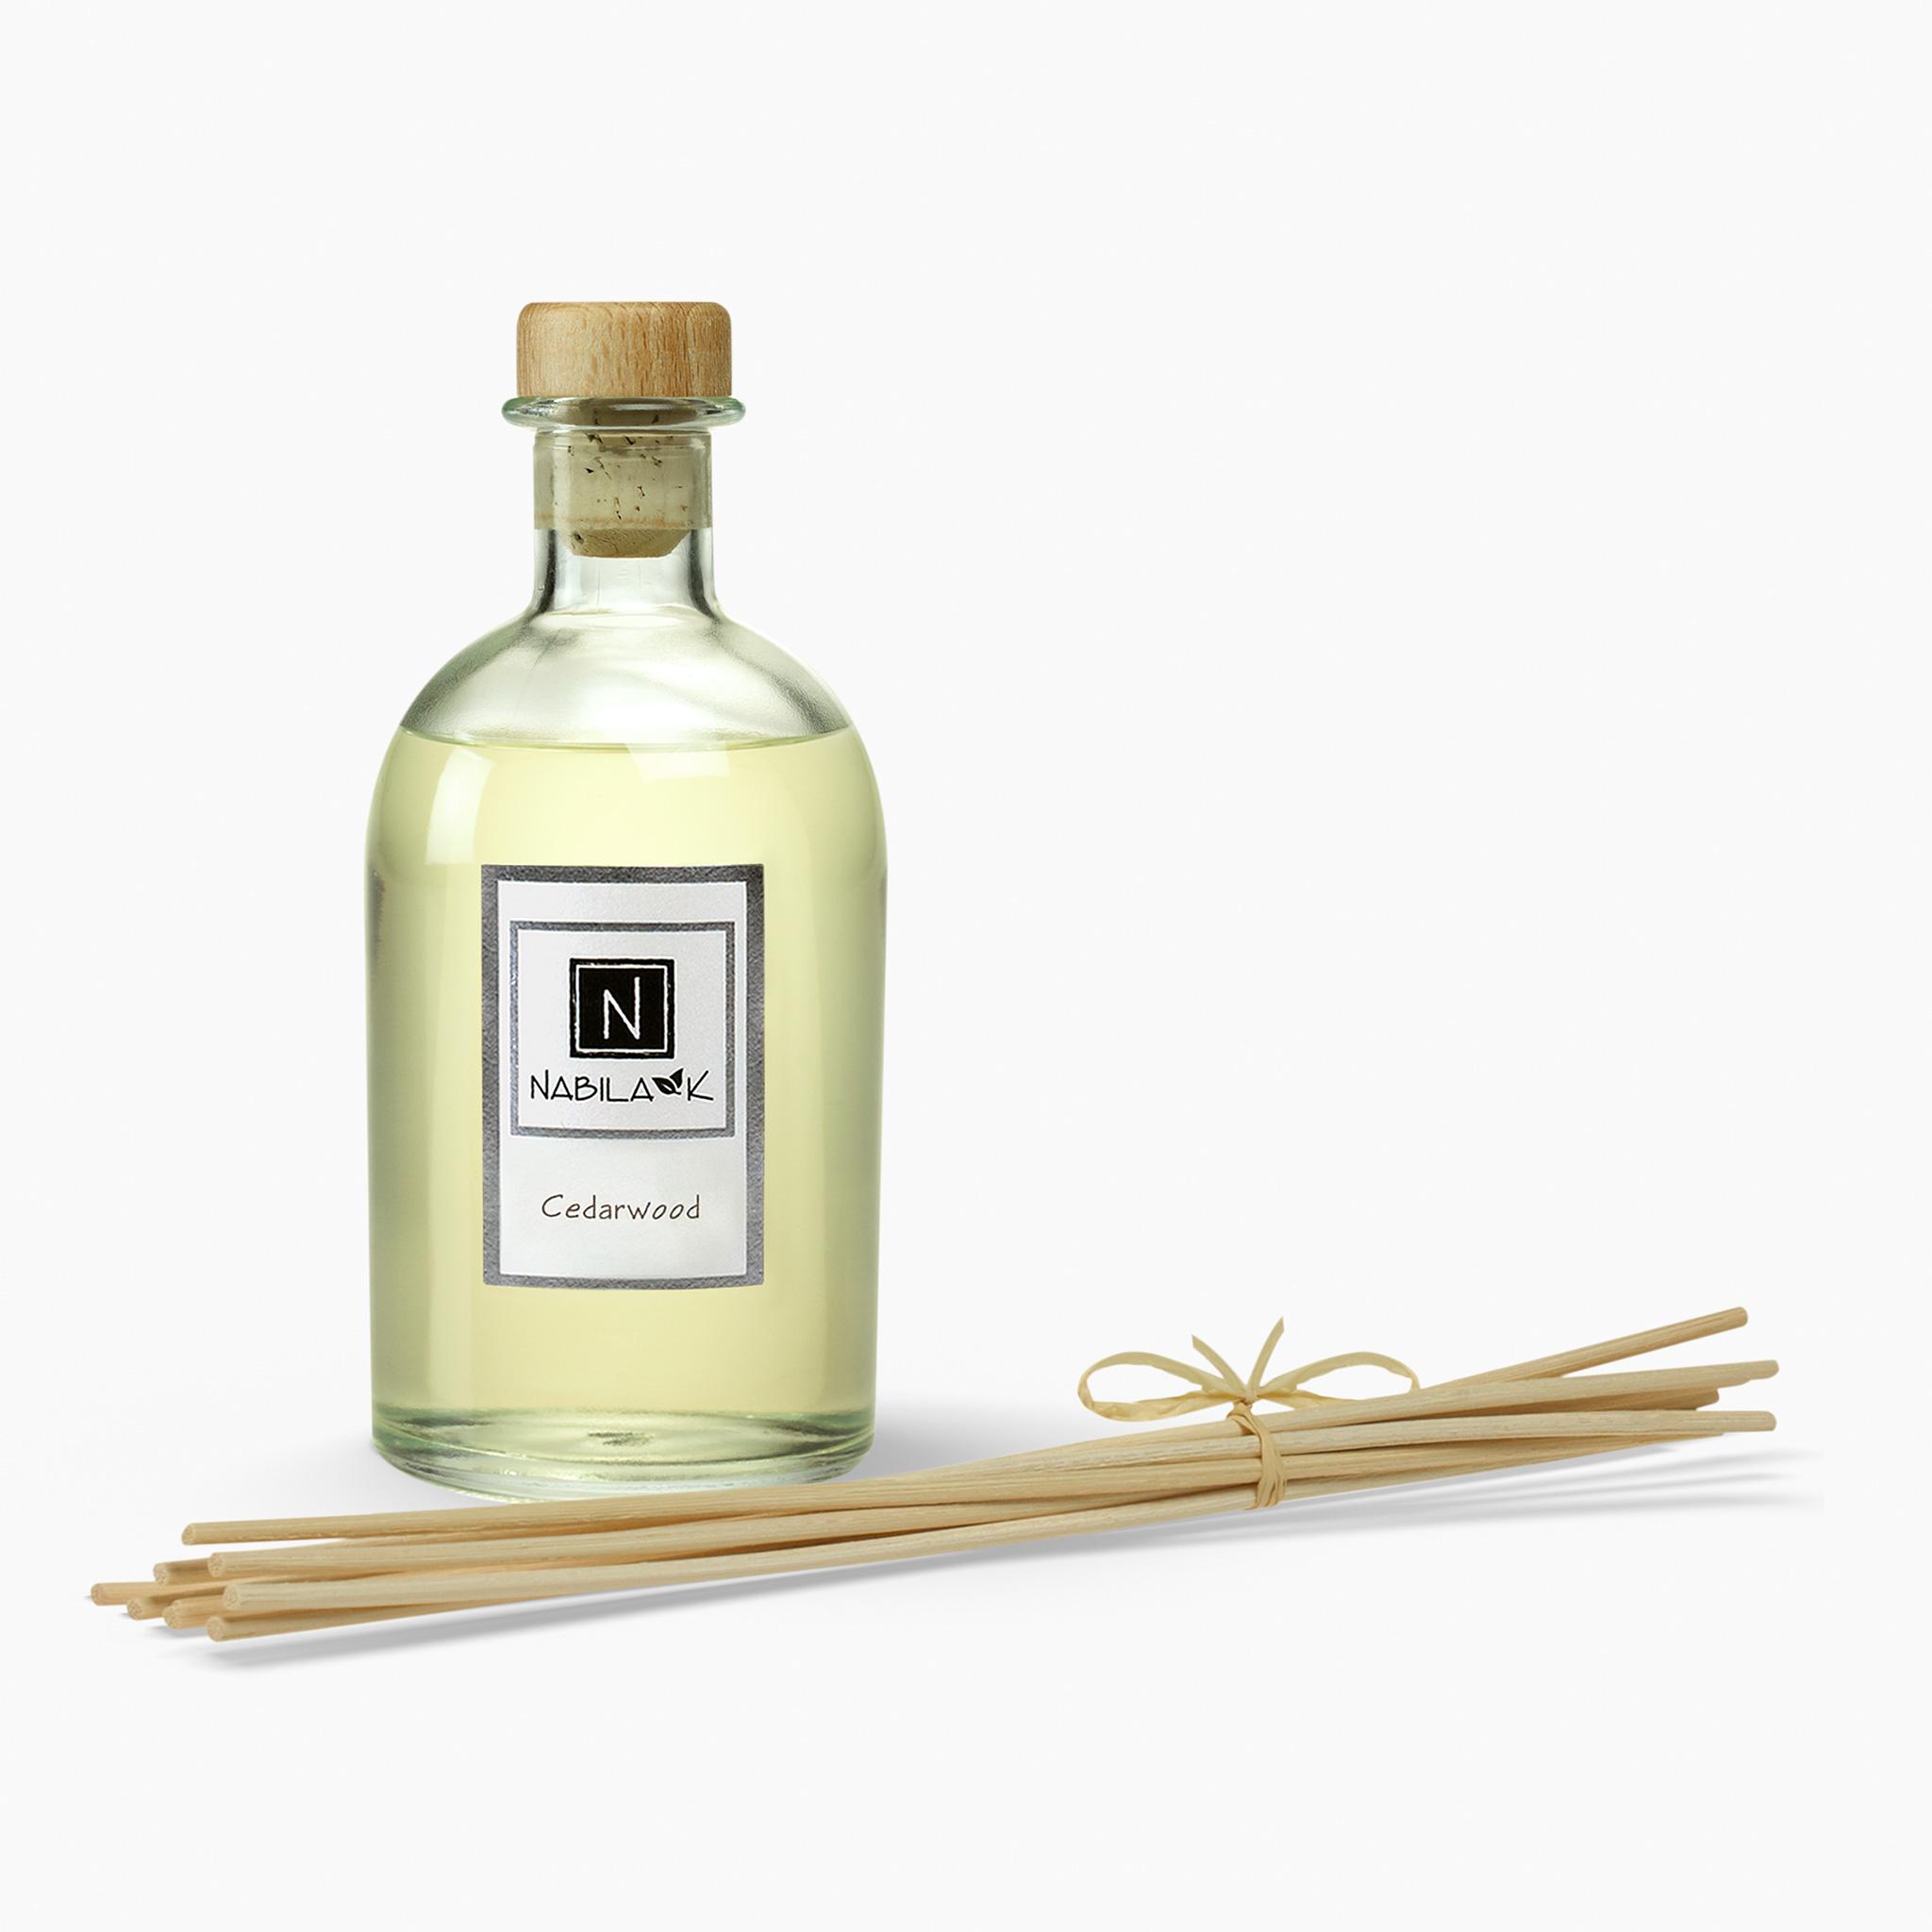 1 Bottle of Nabila K's Cedarwood Diffuser with Reeds